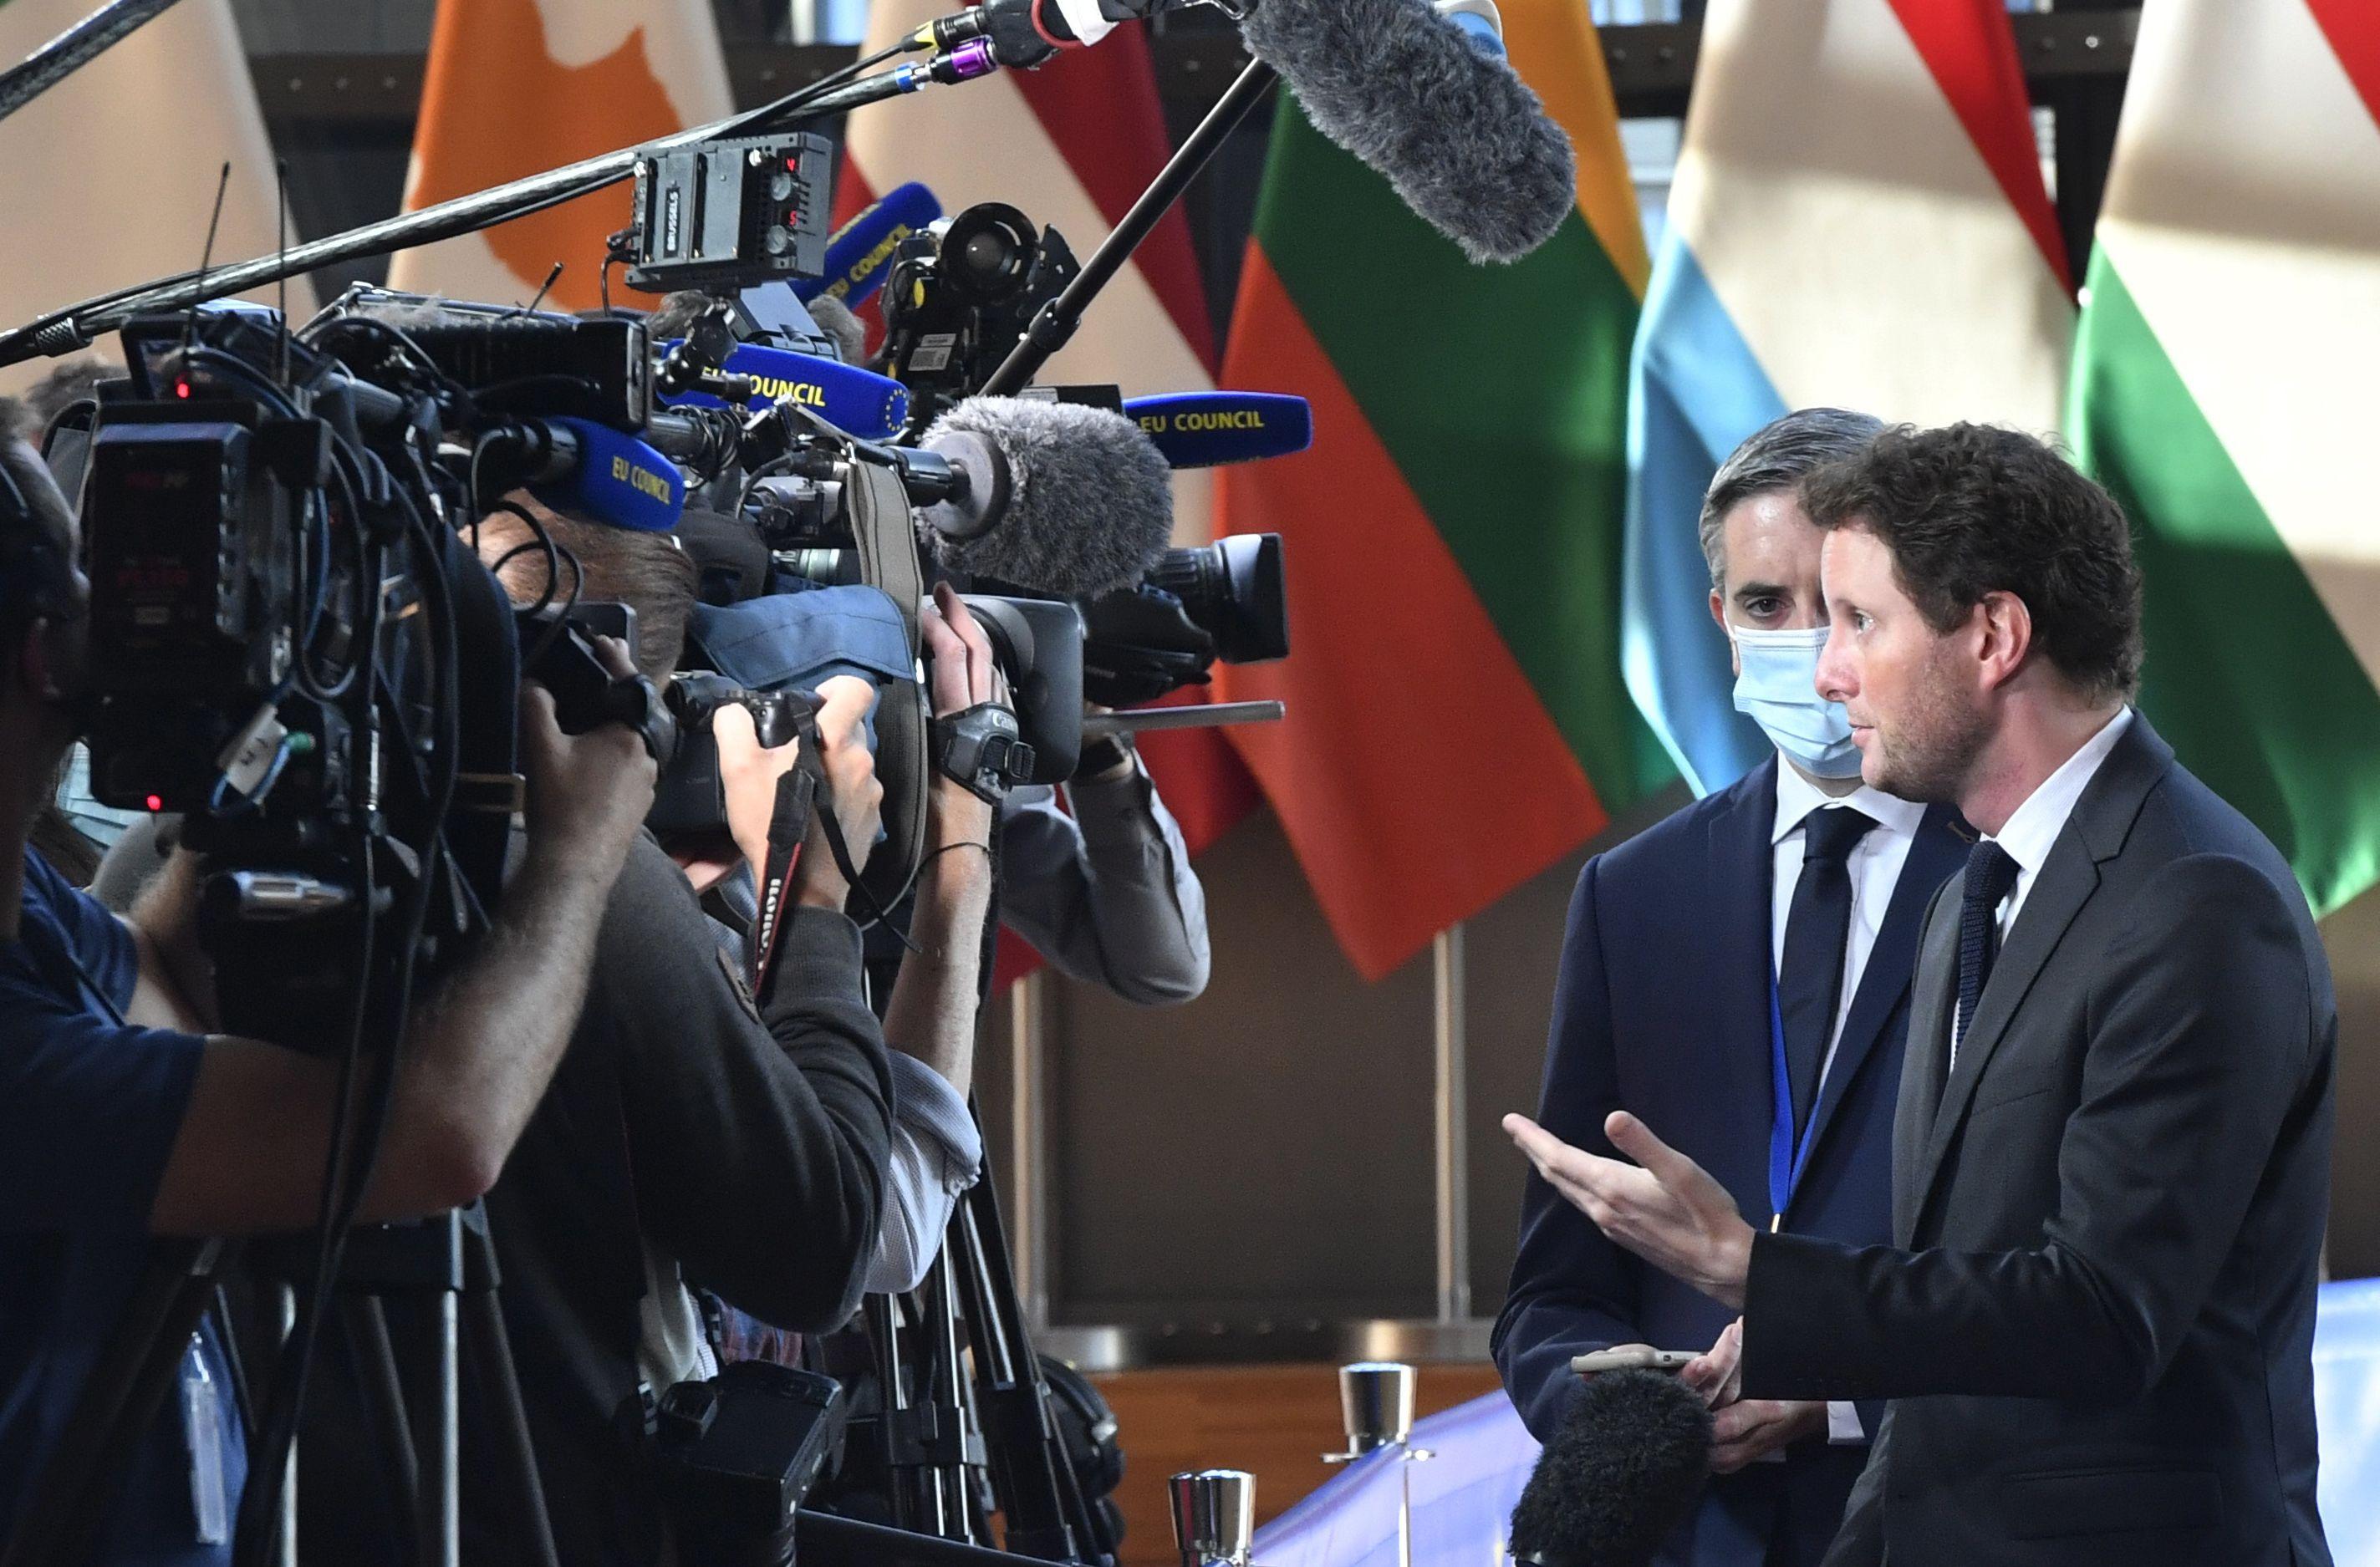 francia acude a ue tras cancelacion de acuerdo con australia